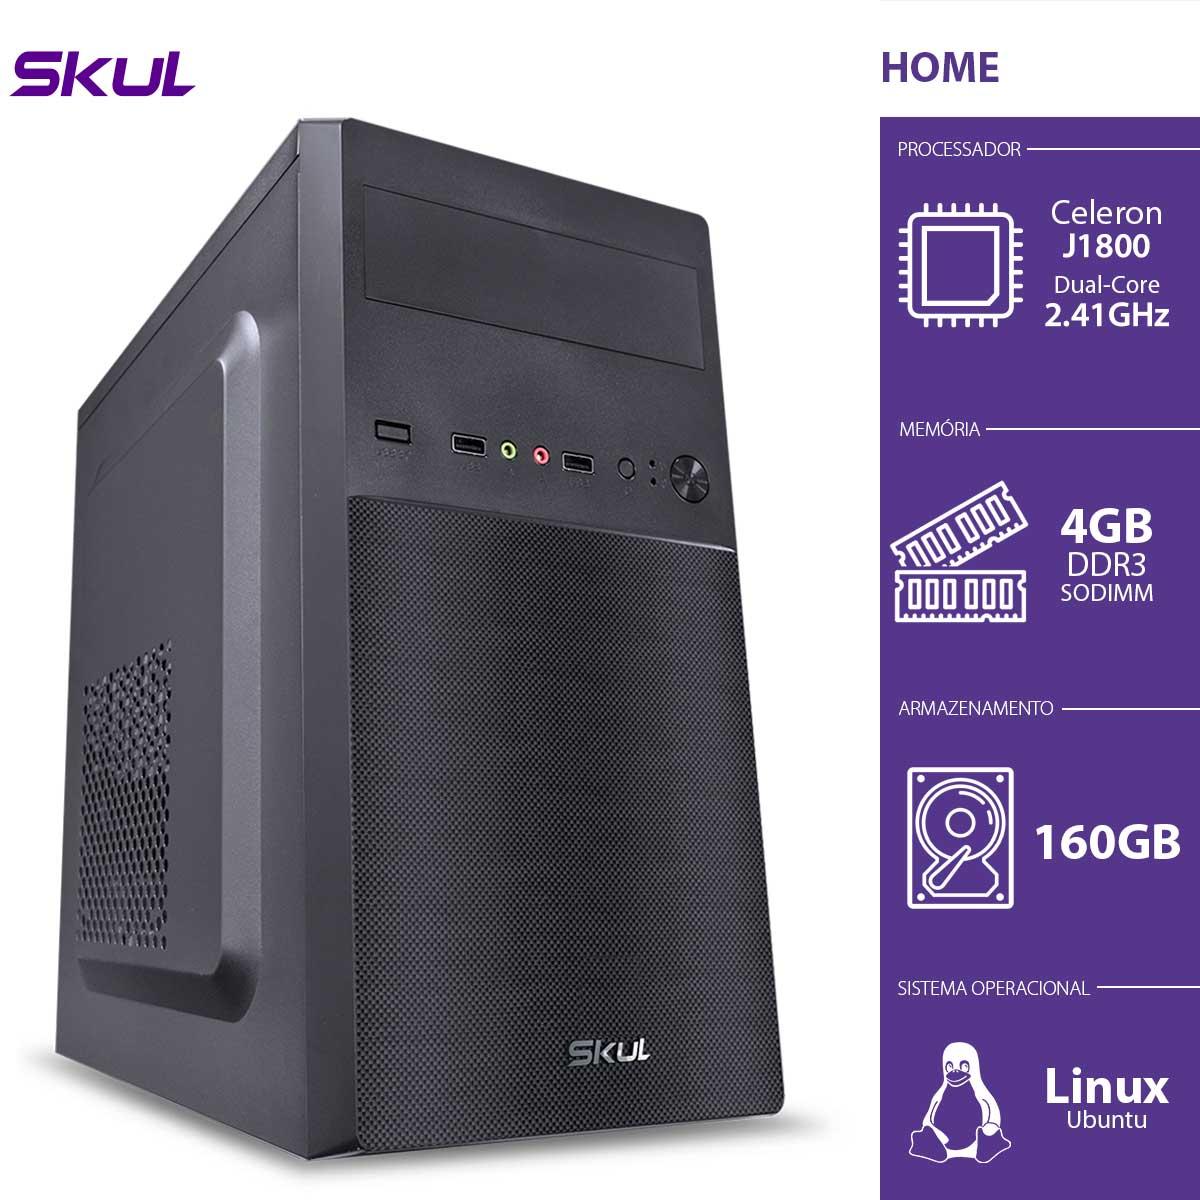 COMPUTADOR HOME H100 - CELERON DUAL CORE J1800 2.41GHZ 4GB DDR3 SODIMM HD 160GB HDMI/VGA FONTE 200W